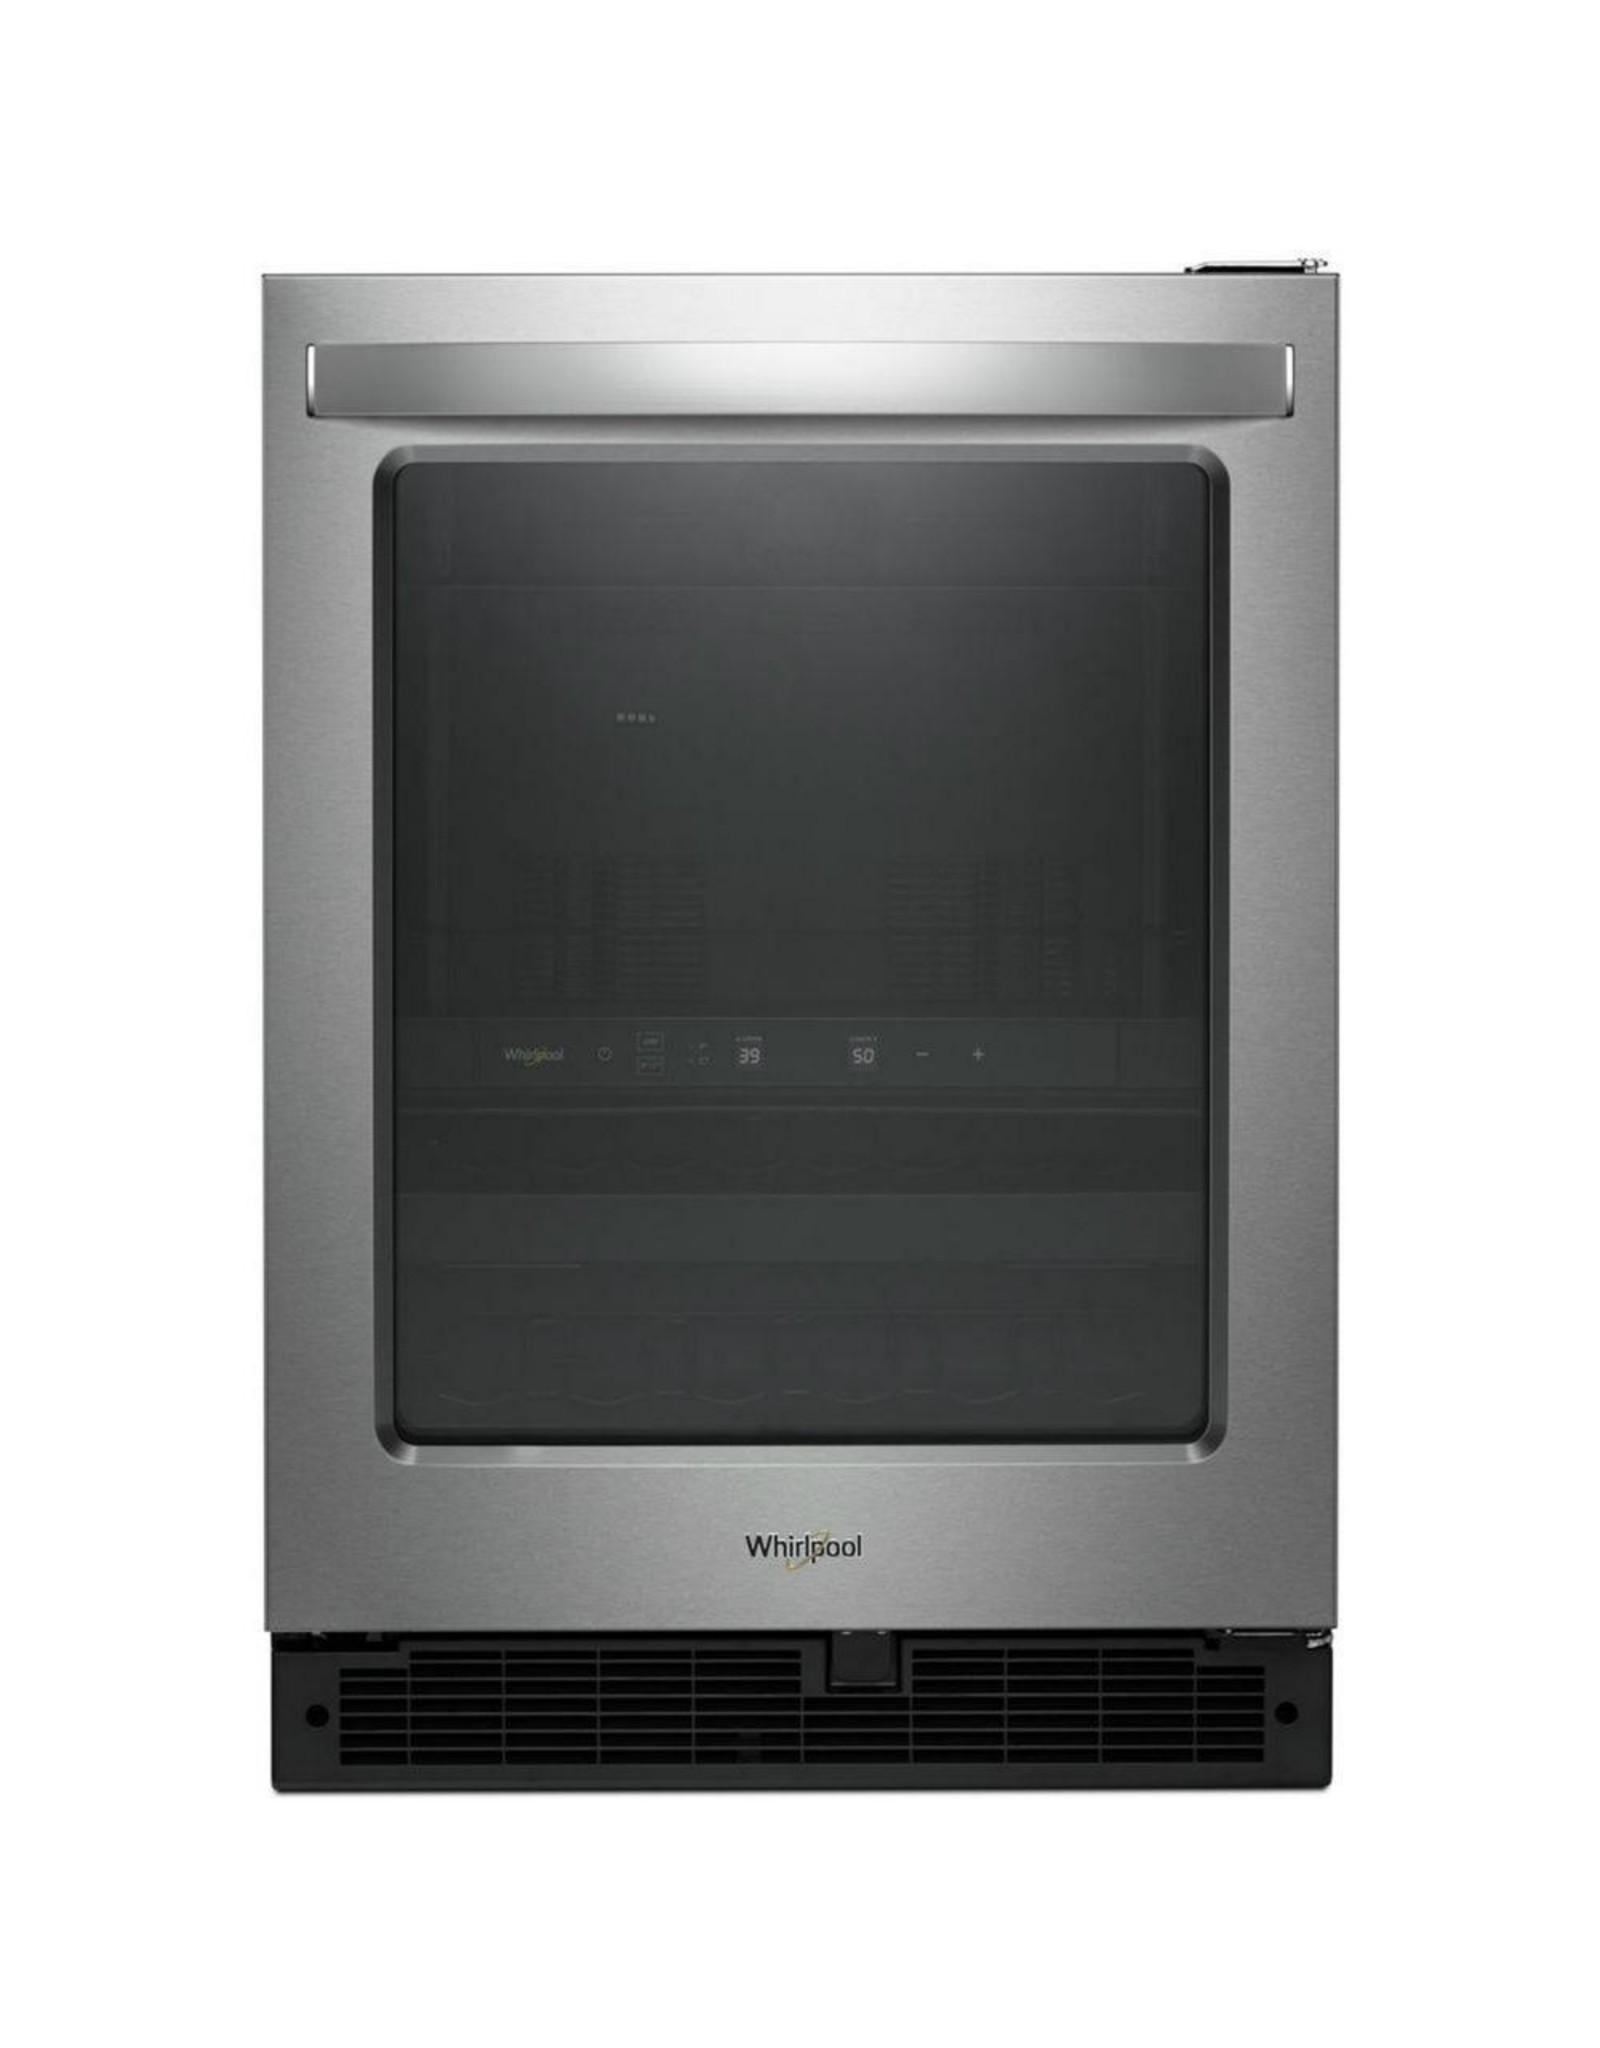 "WUB50X24HZ WHR Licensed Free Standing Refrigerator - 24"" BEV CENTER, GLASS DOOR, FINGER PRINT"